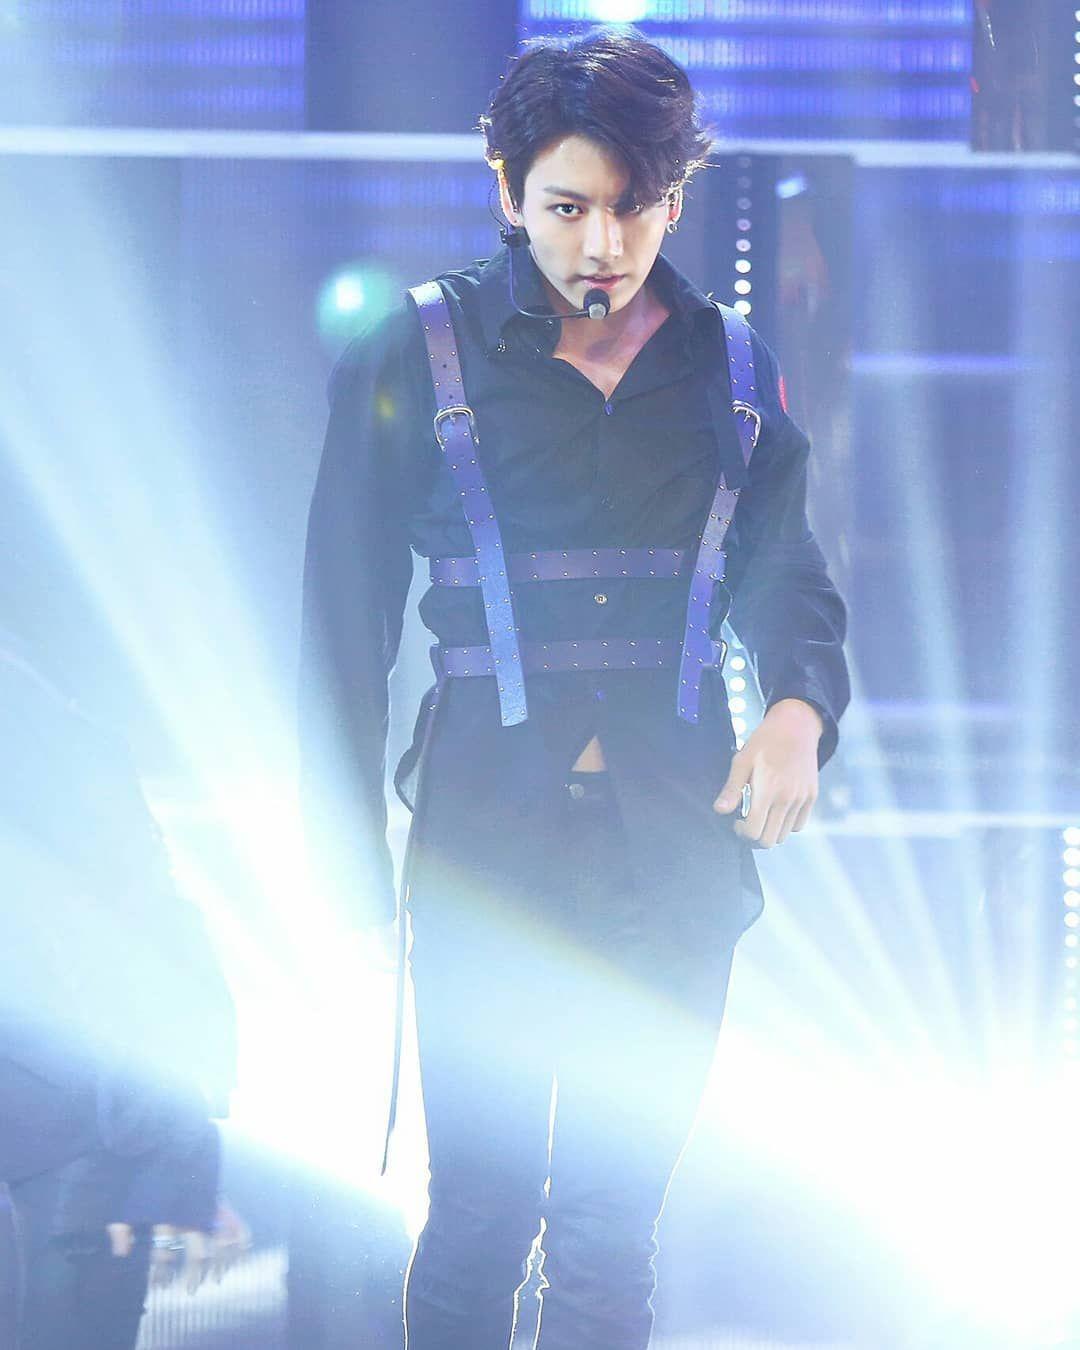 That Harness Can I Choke Jungkook Bts Jeon Jungkook